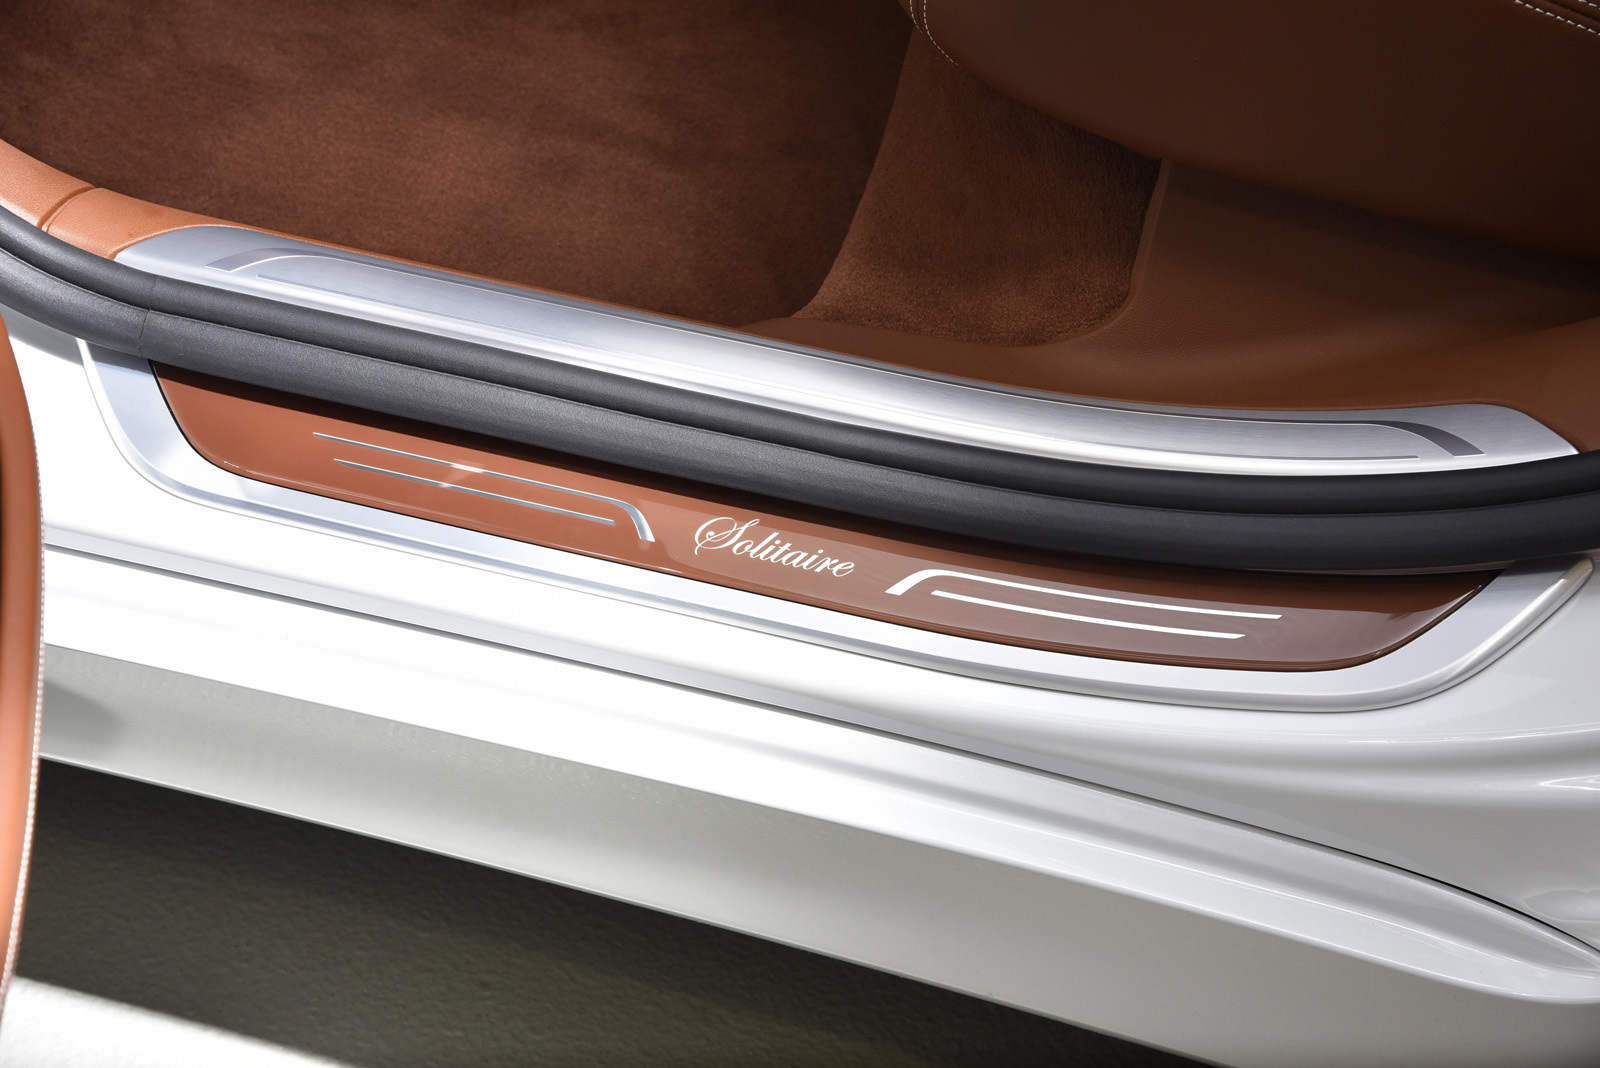 Foto de BMW 750Li xDrive Solitaire Edition (2/30)